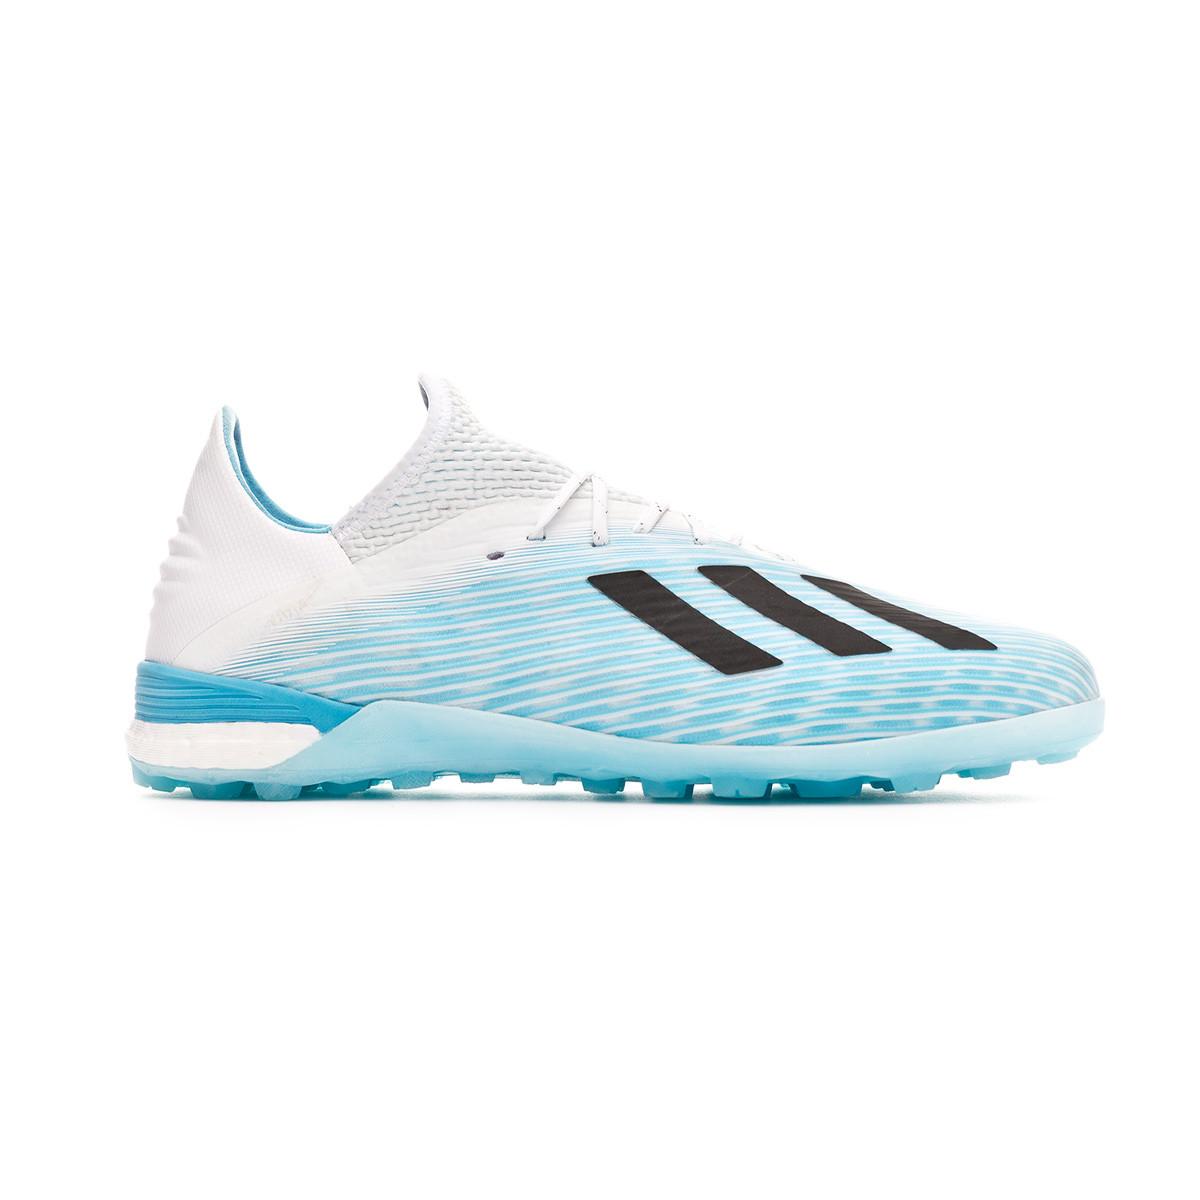 Chaussure de football adidas X 19.1 Turf